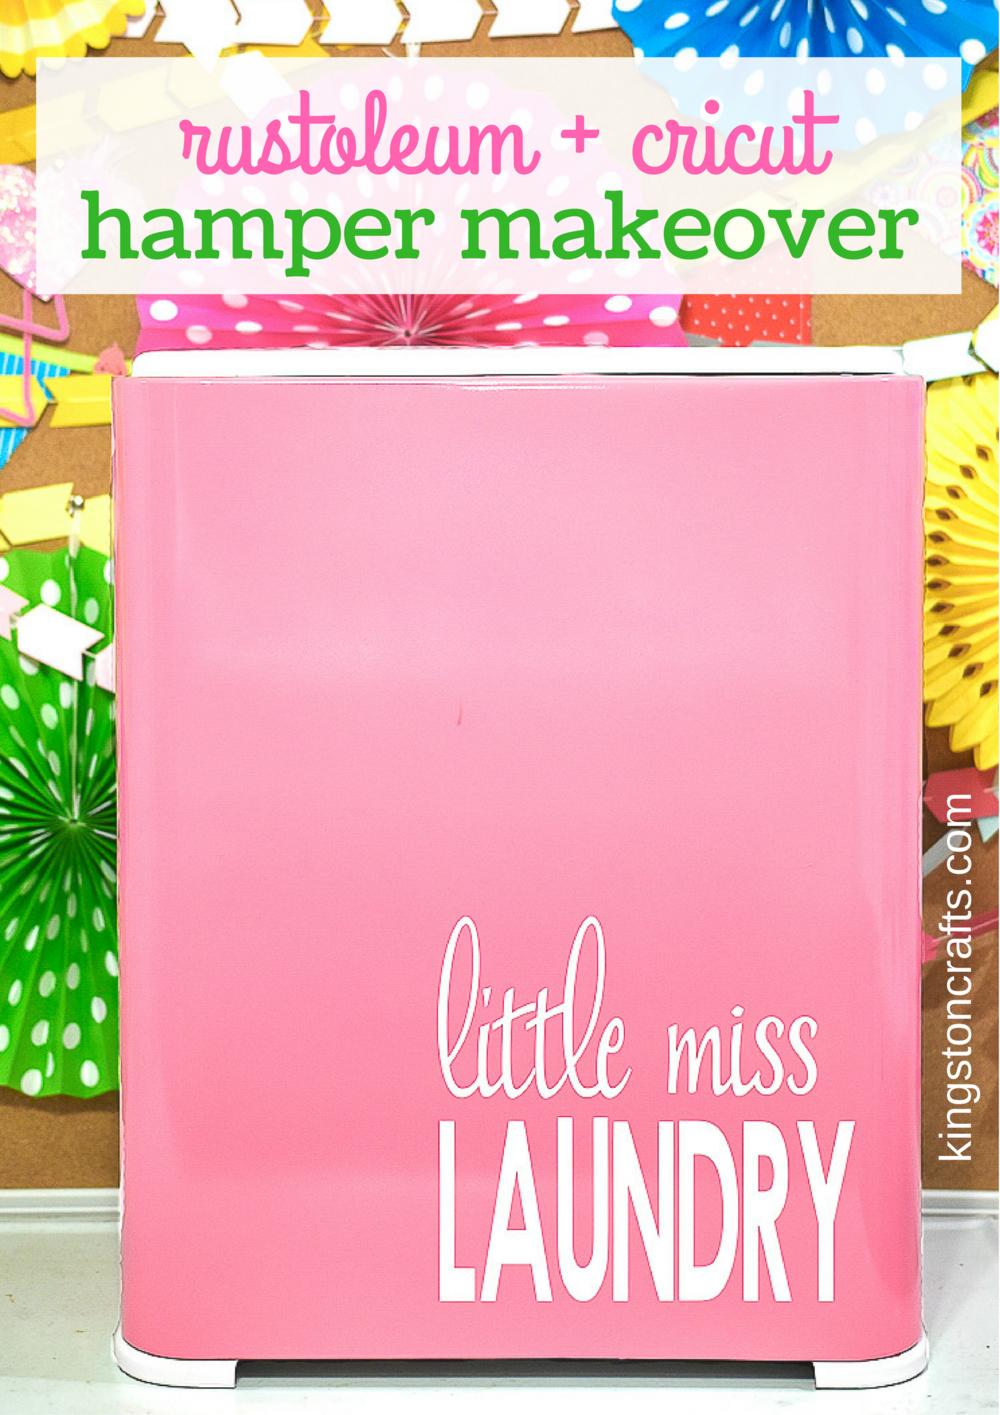 Little Miss Laundry Hamper